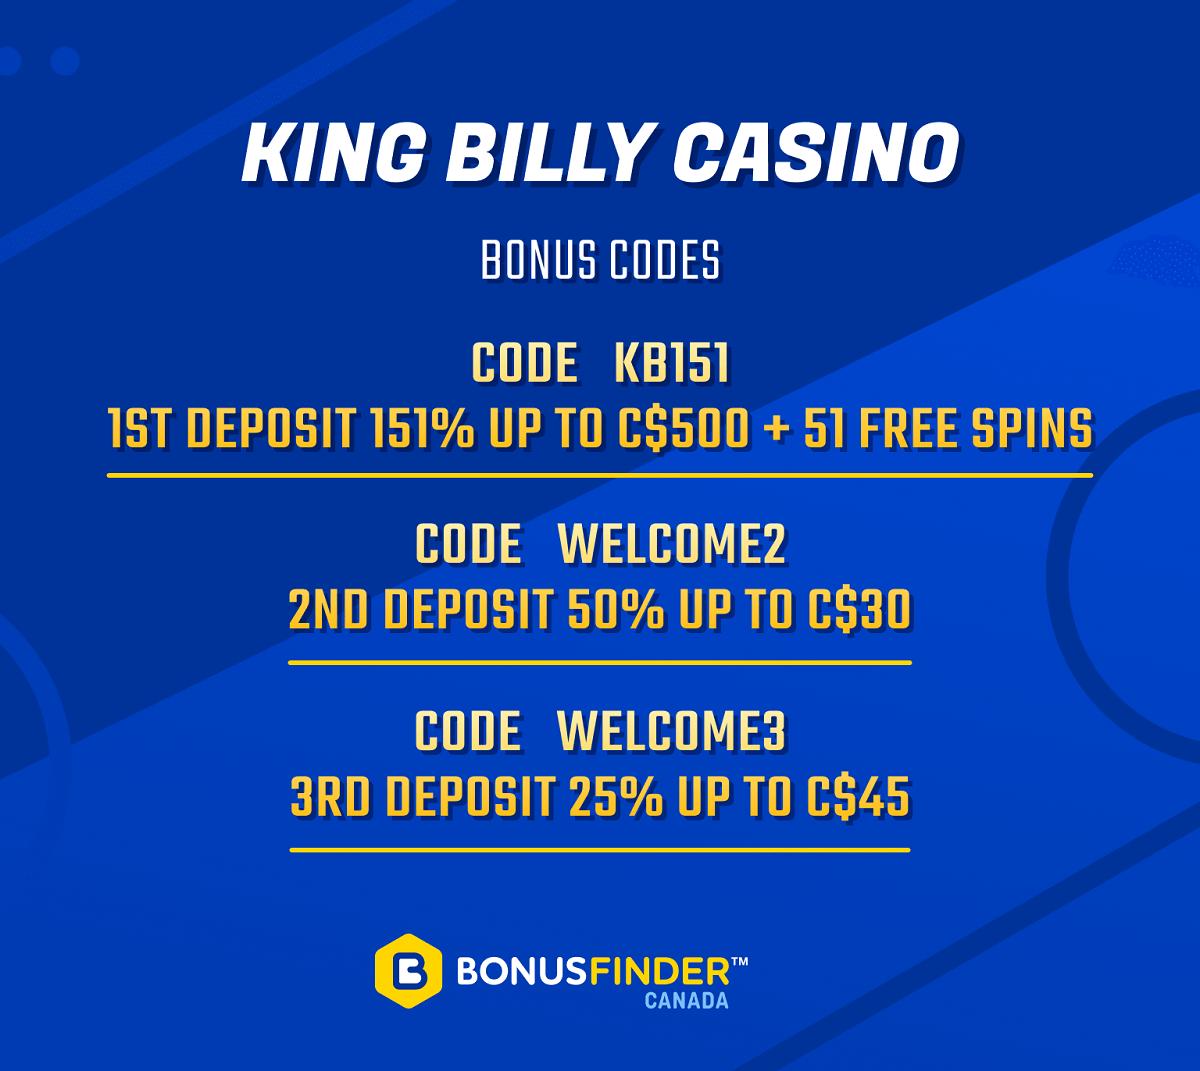 King Billy bonus codes